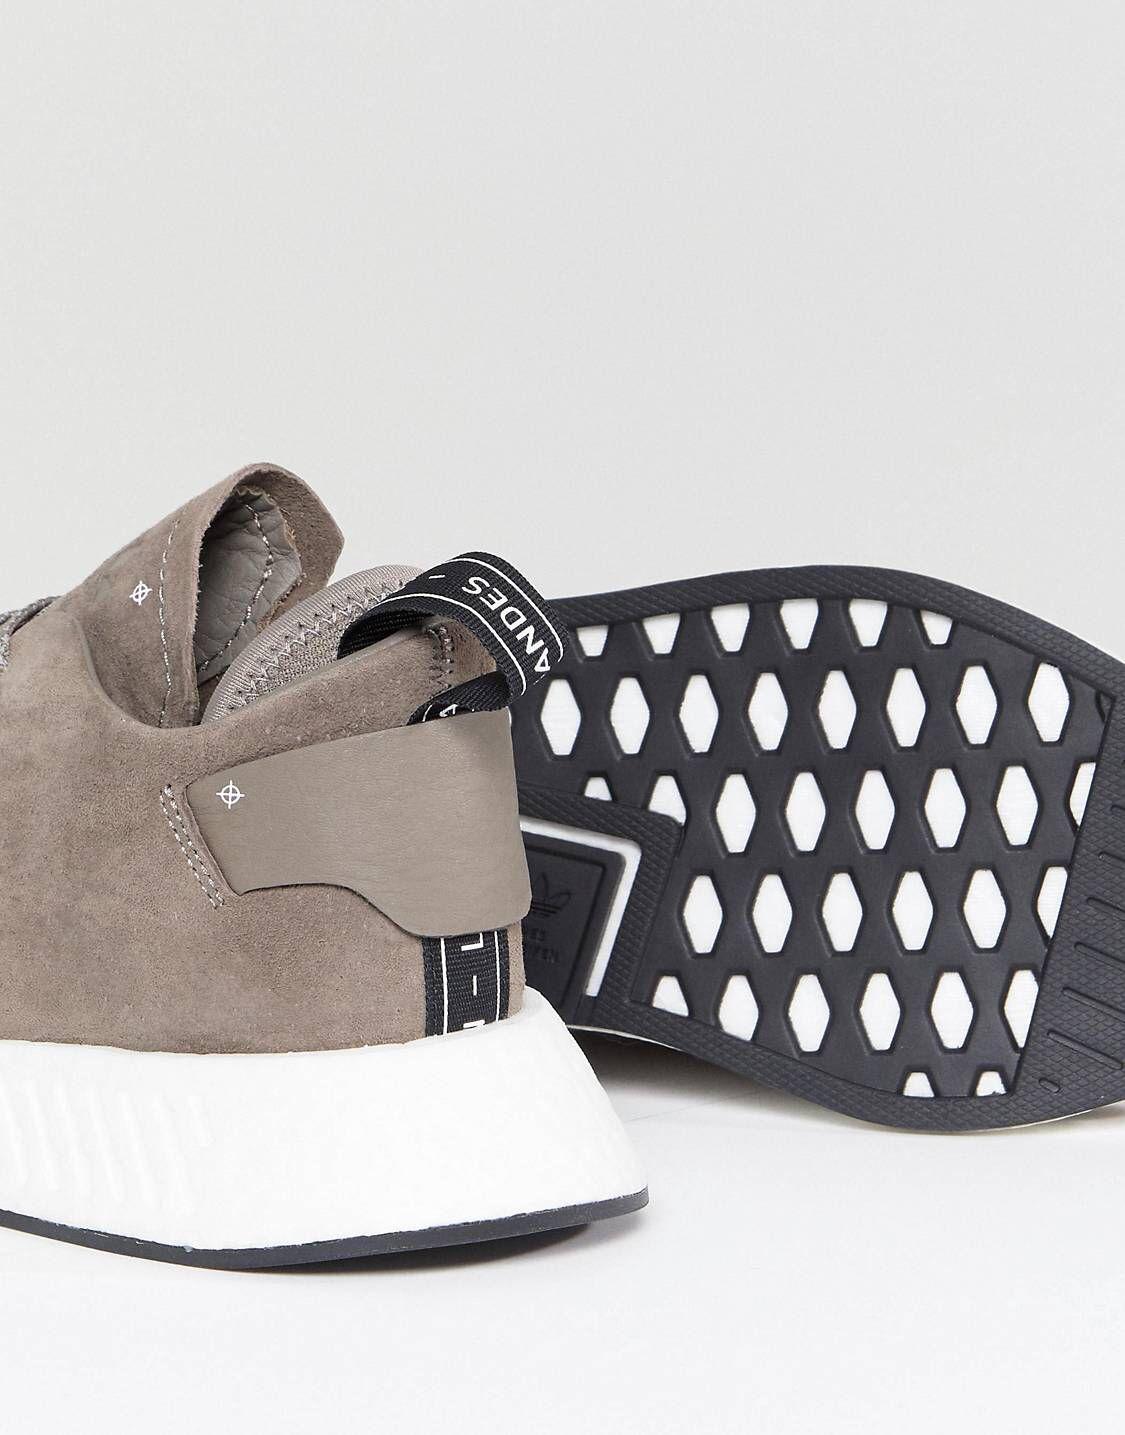 on sale c3383 31012 Nmd, Barefoot, Adidas Originals, Taupe, Fashion Online